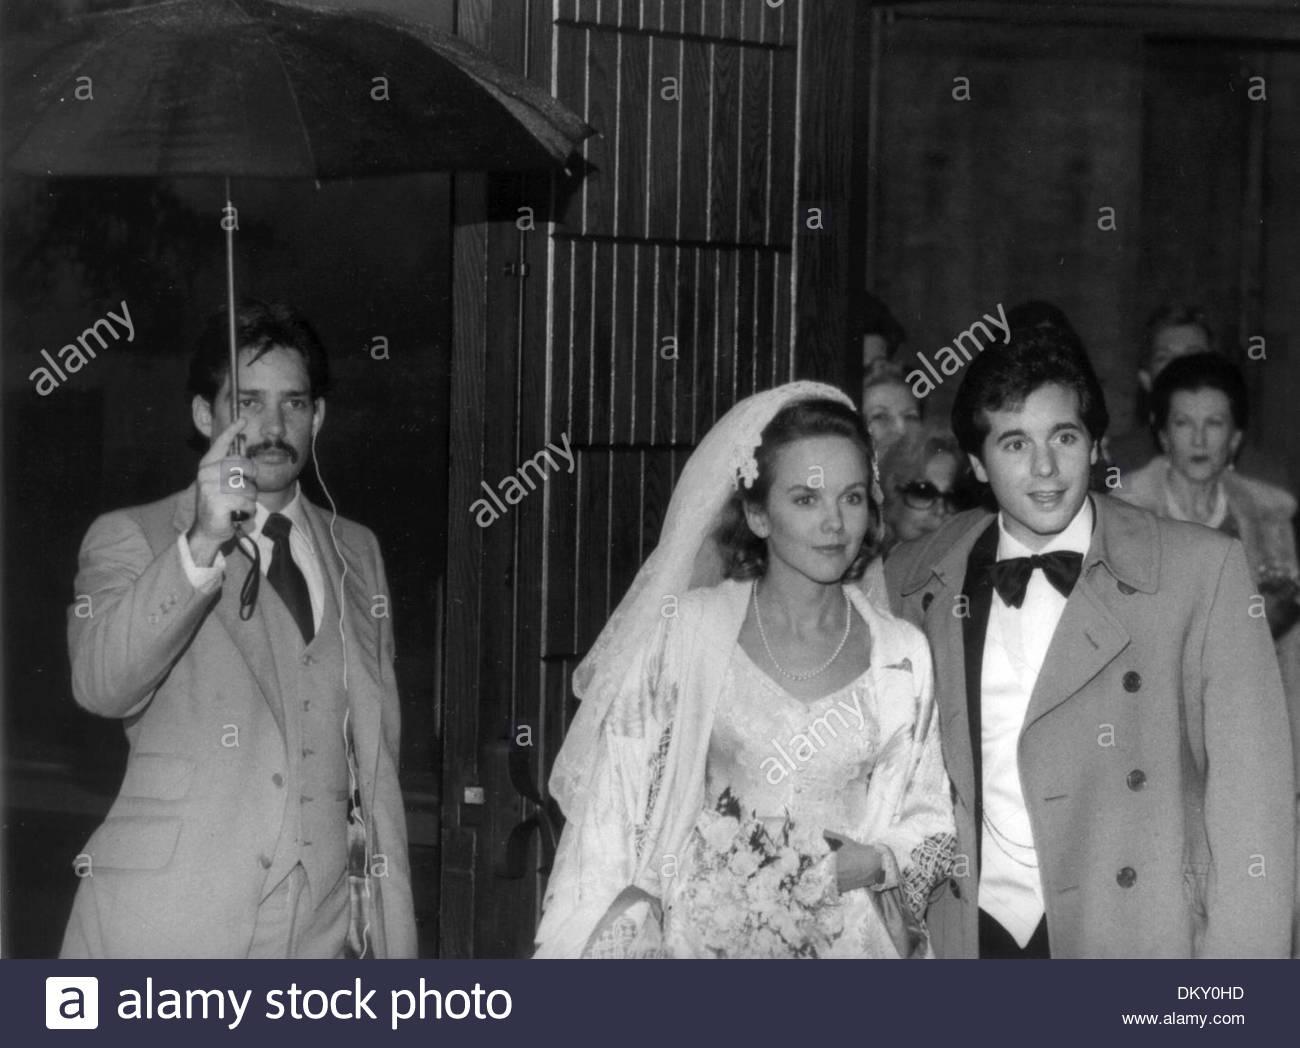 oct  15  1999 - linda purl  desi arnaz jr  wedding  ralph stock photo  63902761